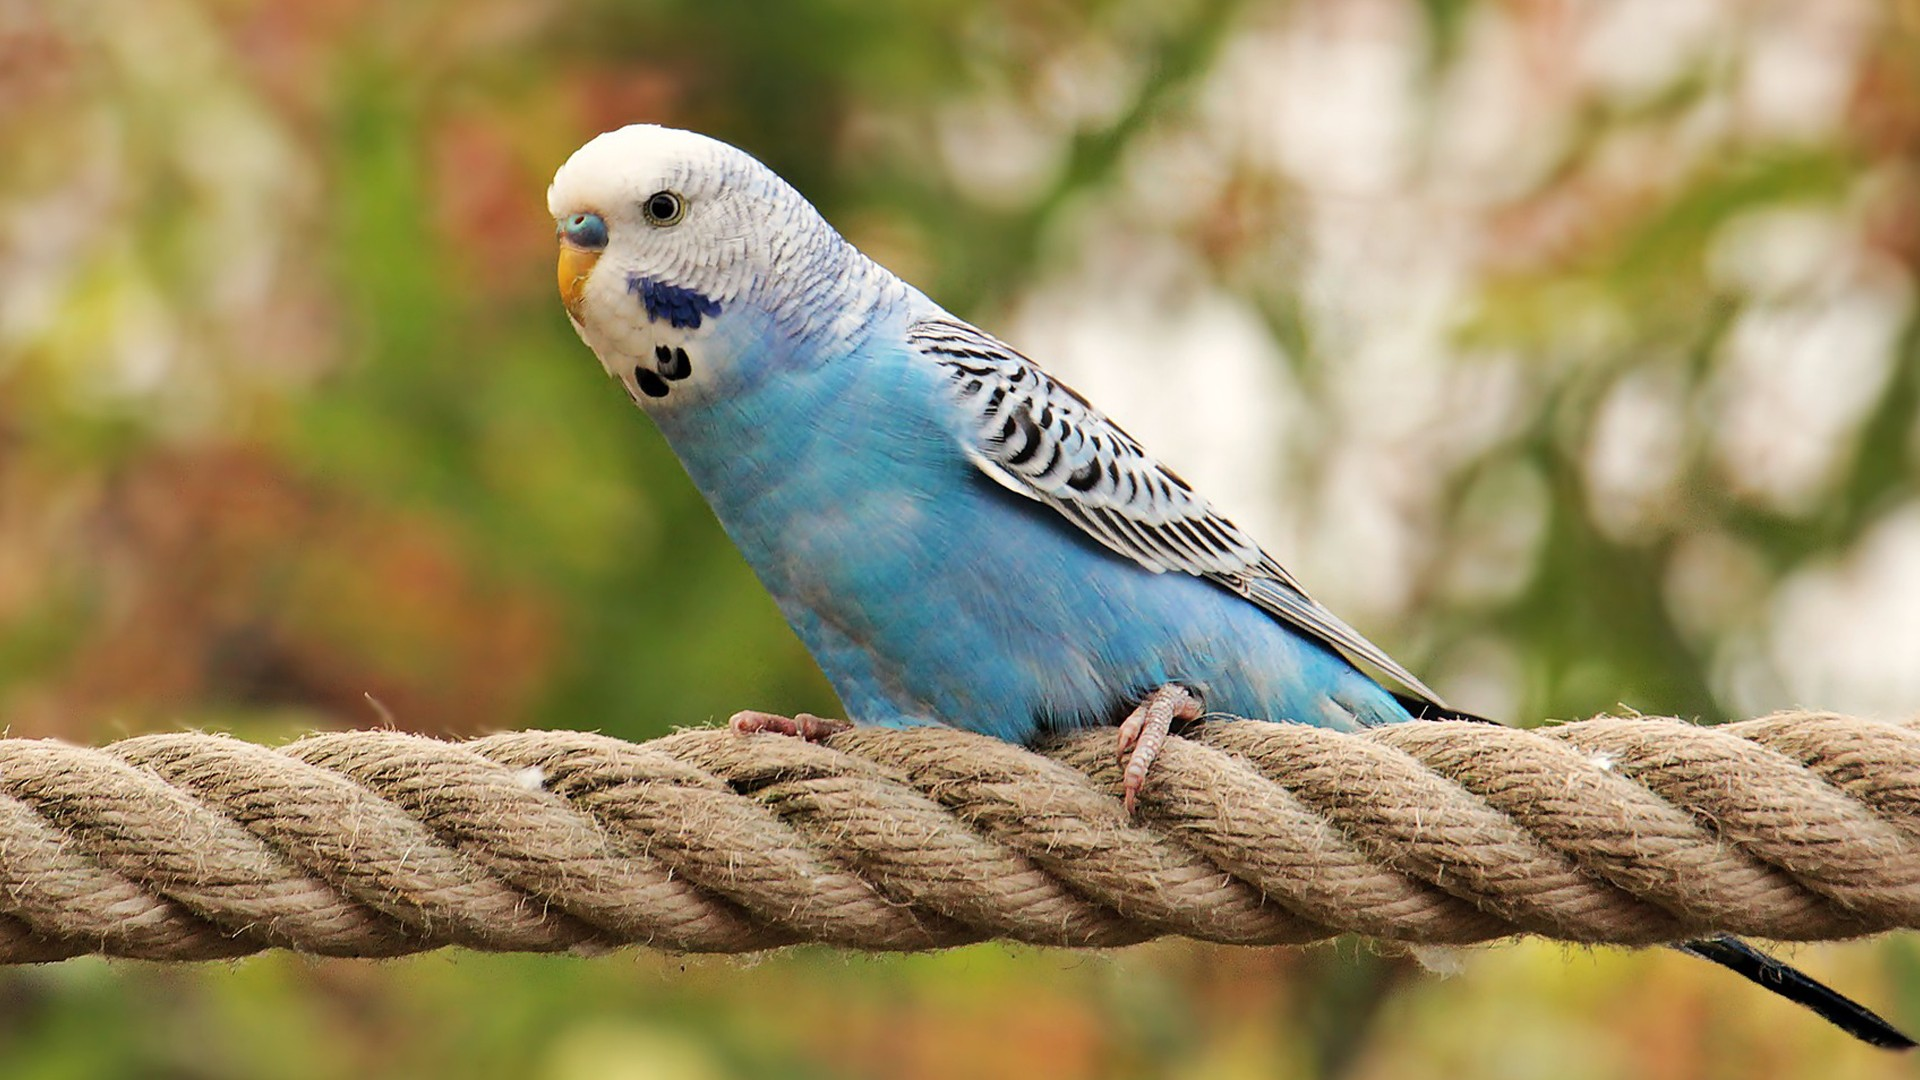 Modrá andulka na provaze